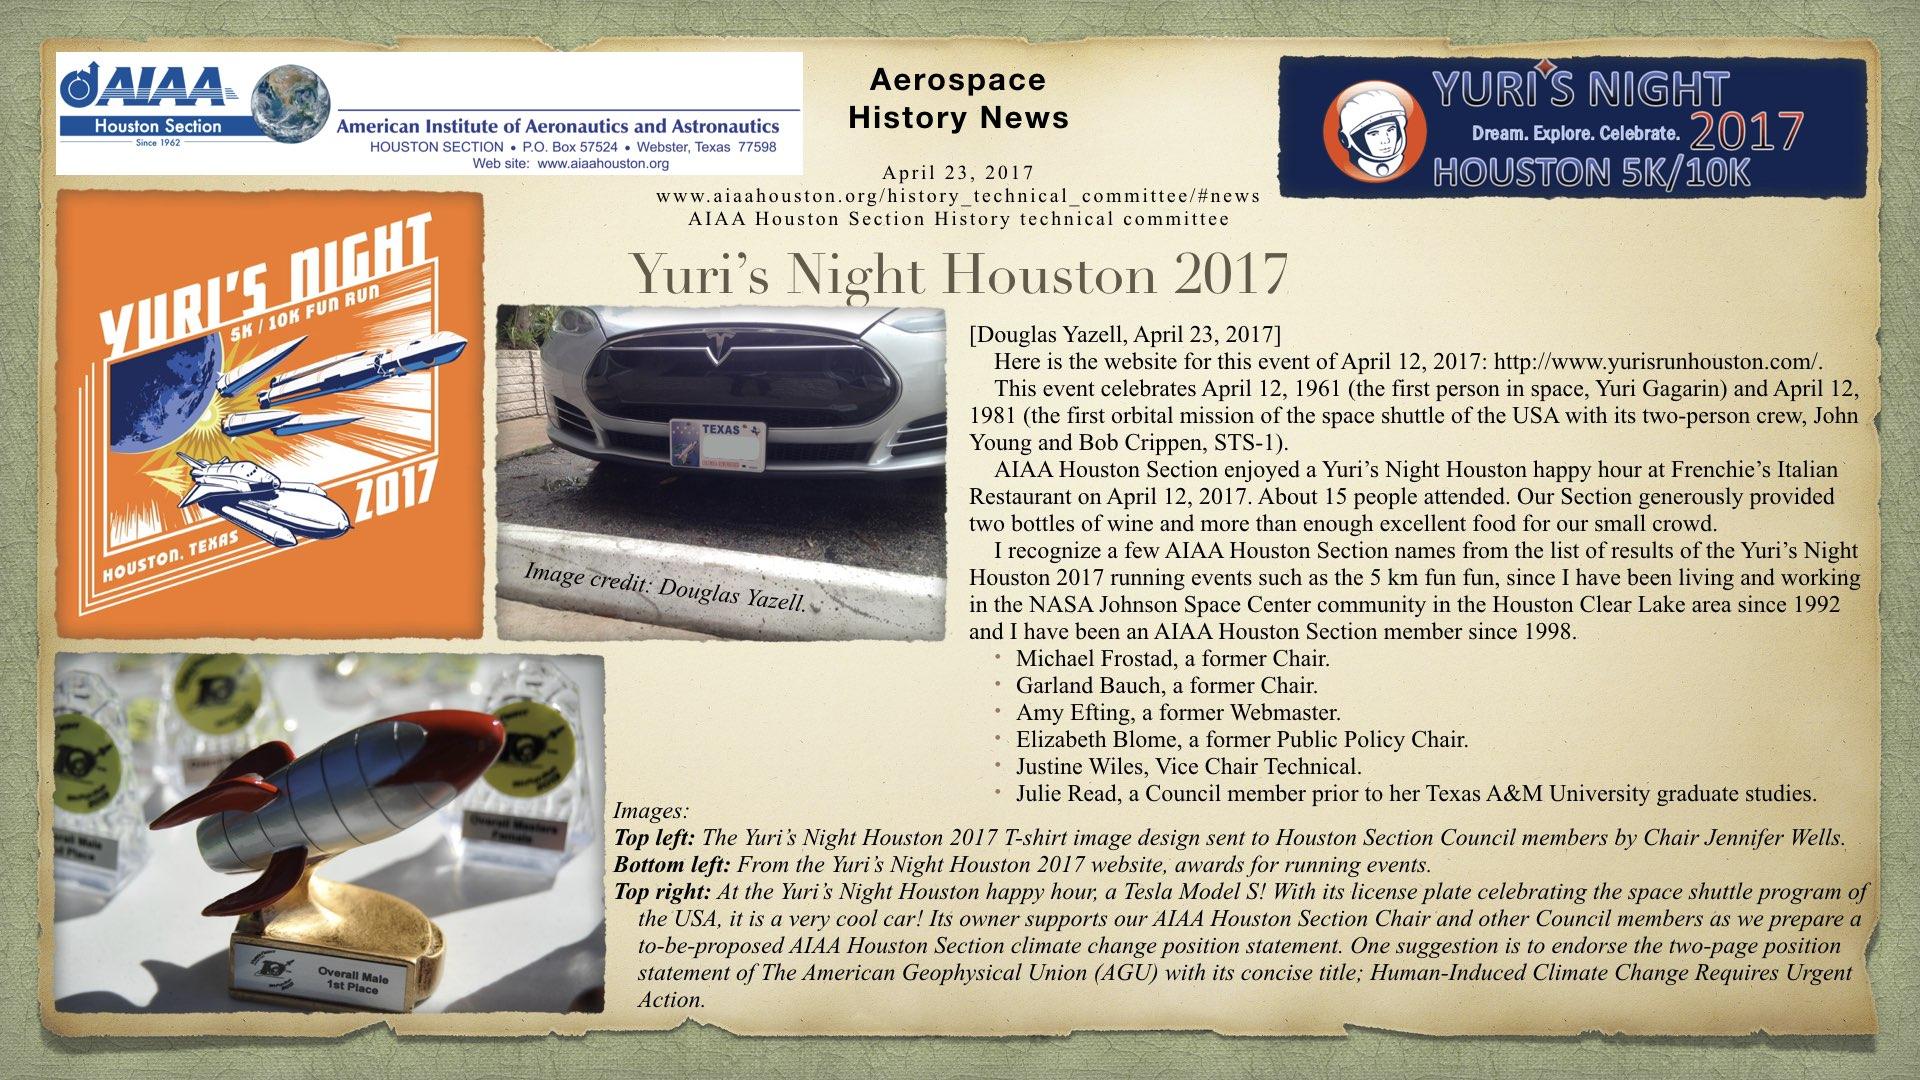 Above: Yuri's Night Houston 2017. (Click to zoom.)